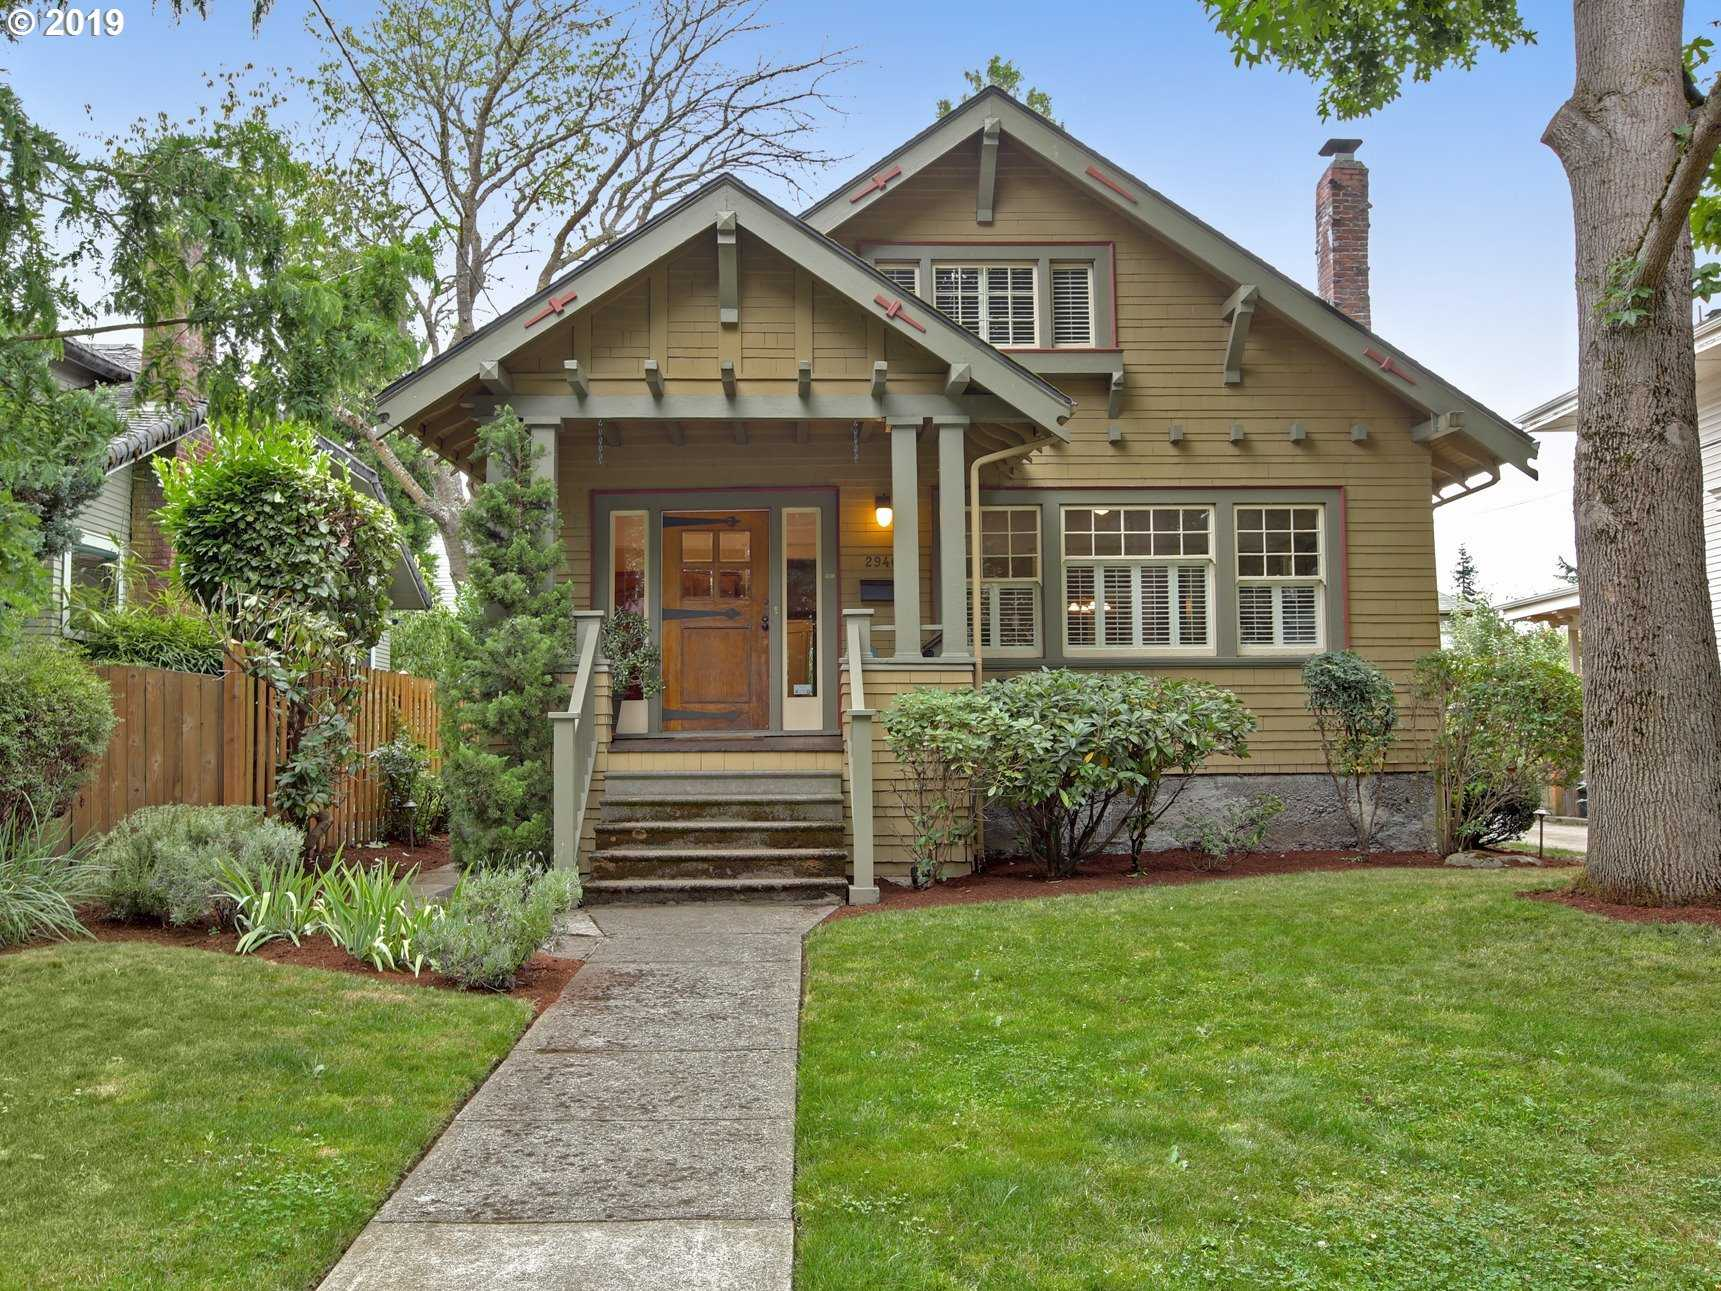 $1,050,000 - 4Br/3Ba -  for Sale in Irvington, Portland